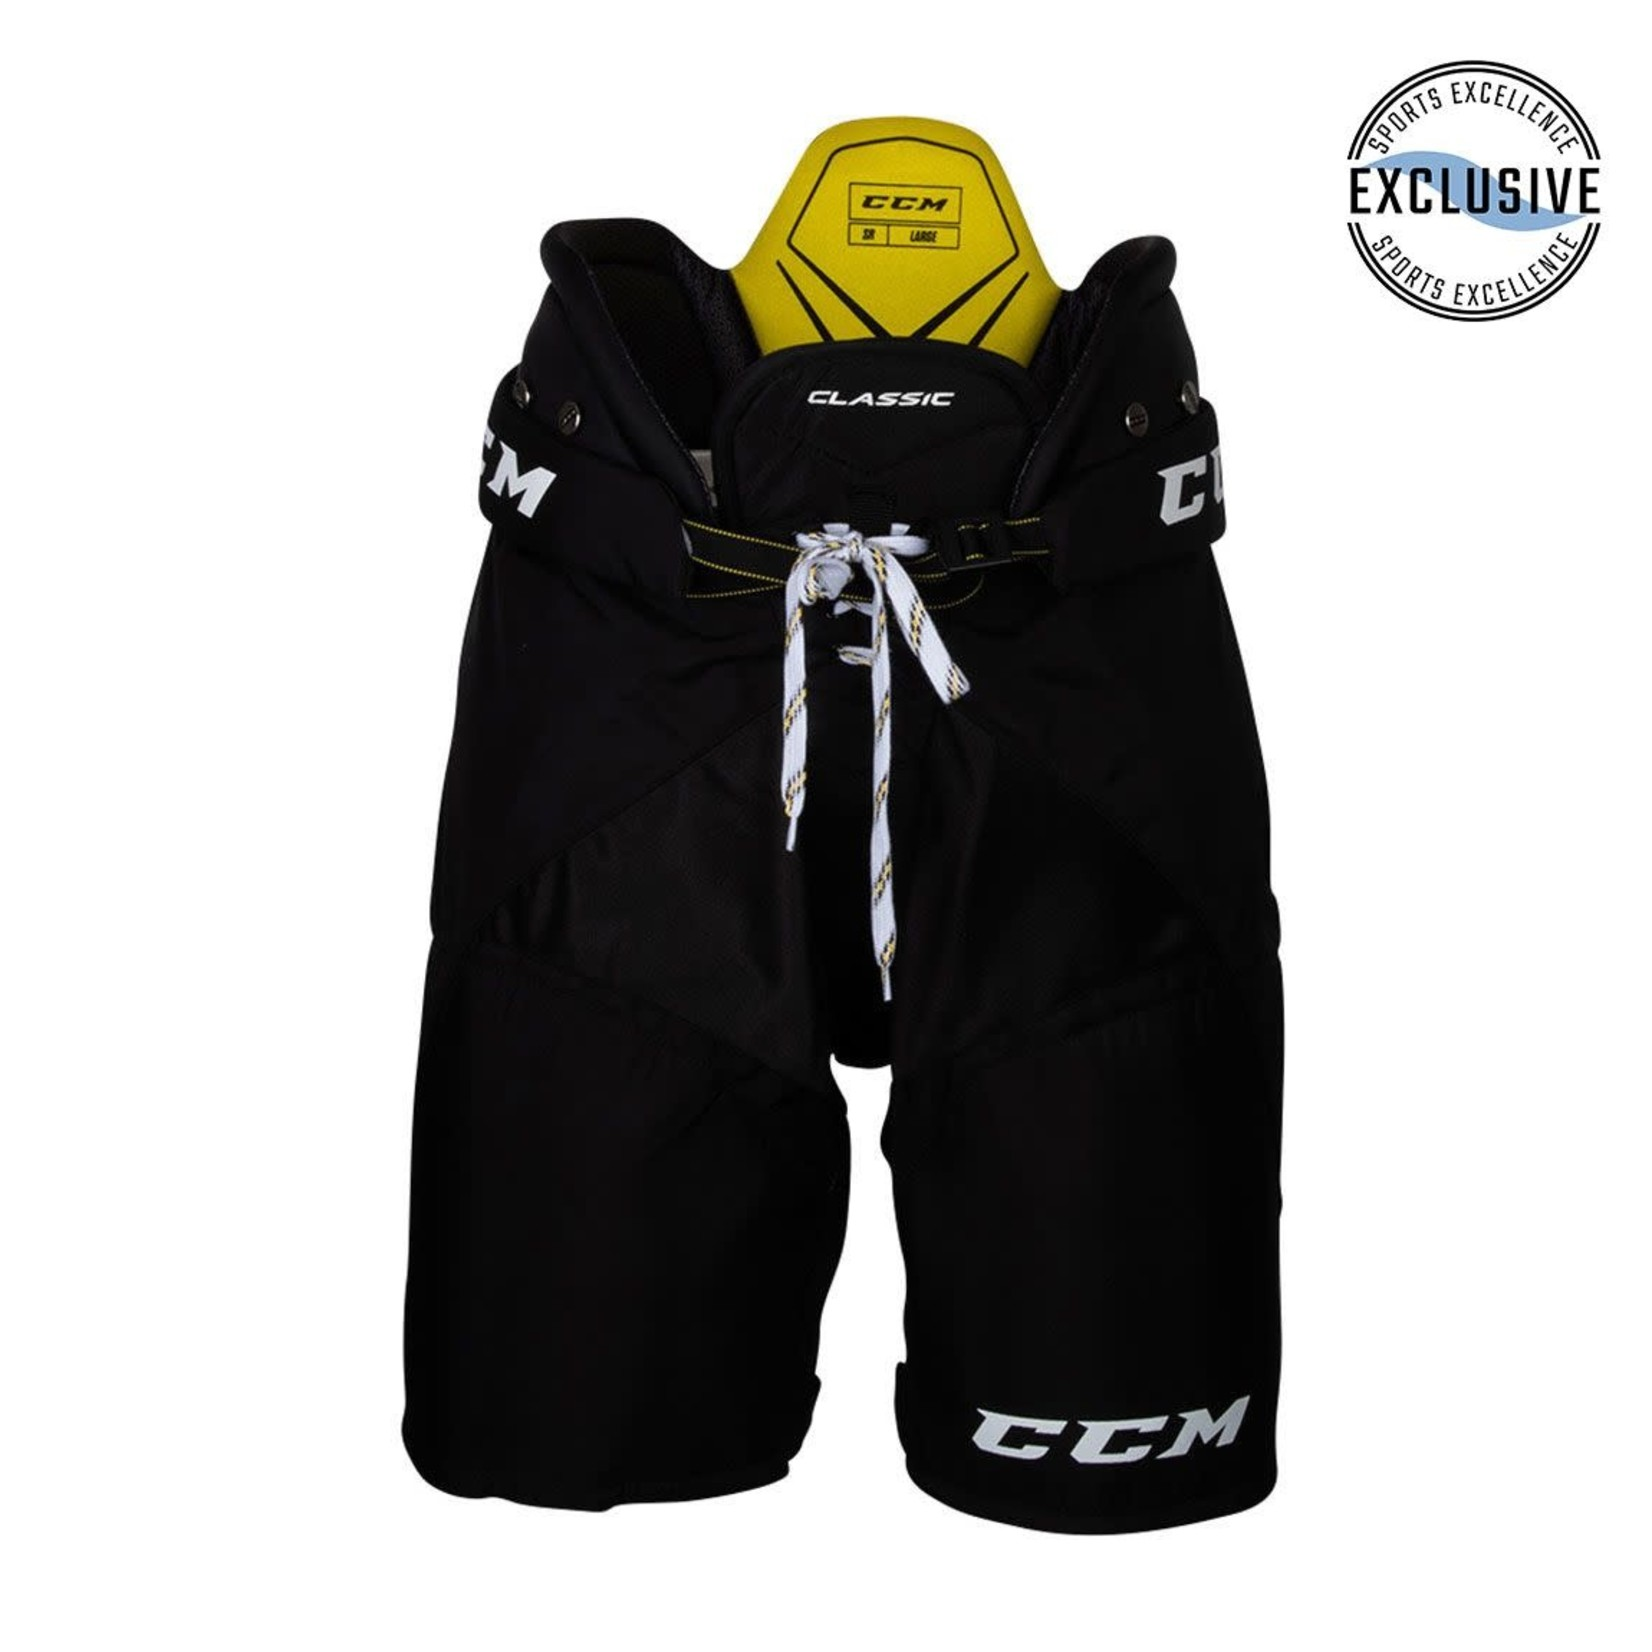 CCM CCM Hockey Pants, Tacks Classic, Junior